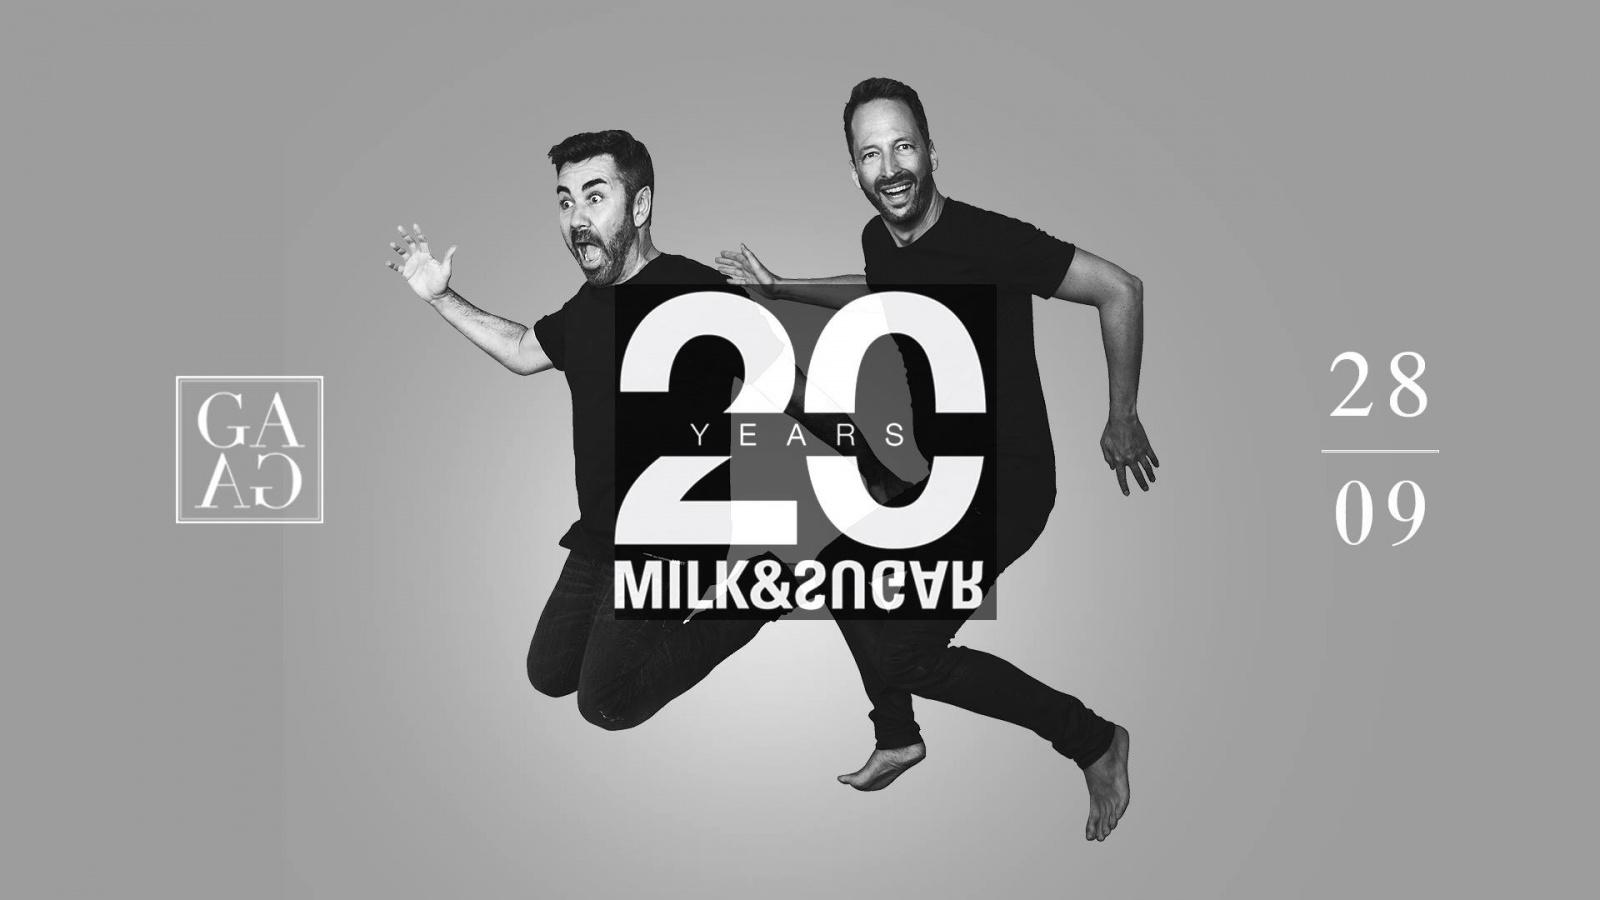 Milk & Sugar live at GAGA